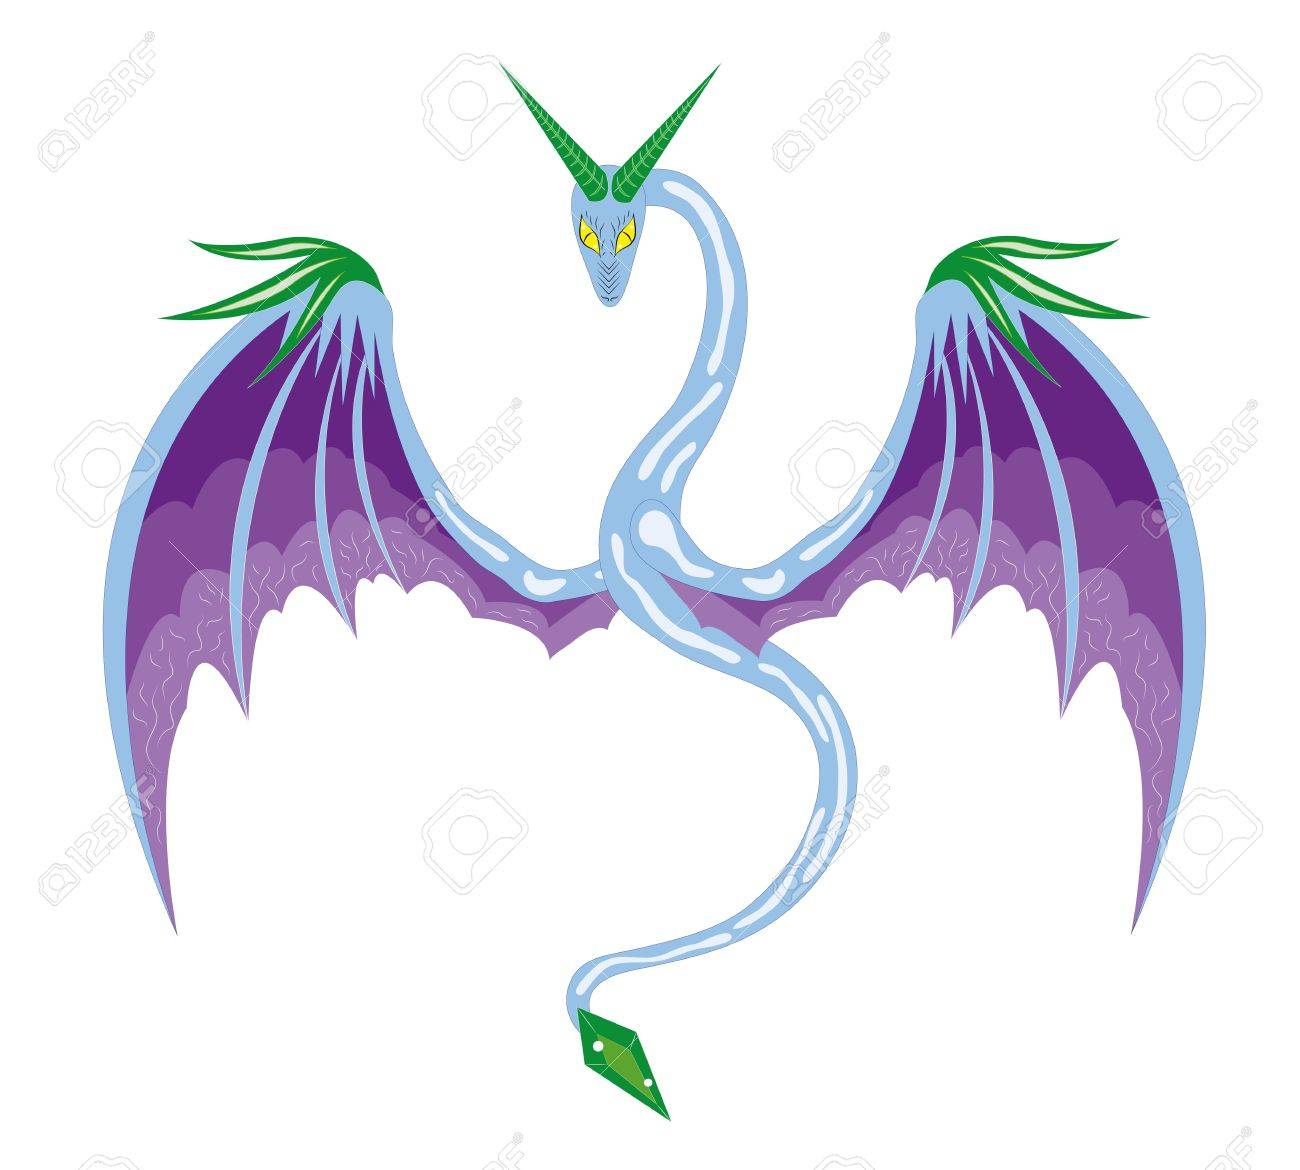 Winter winged snake Stock Vector - 16873436